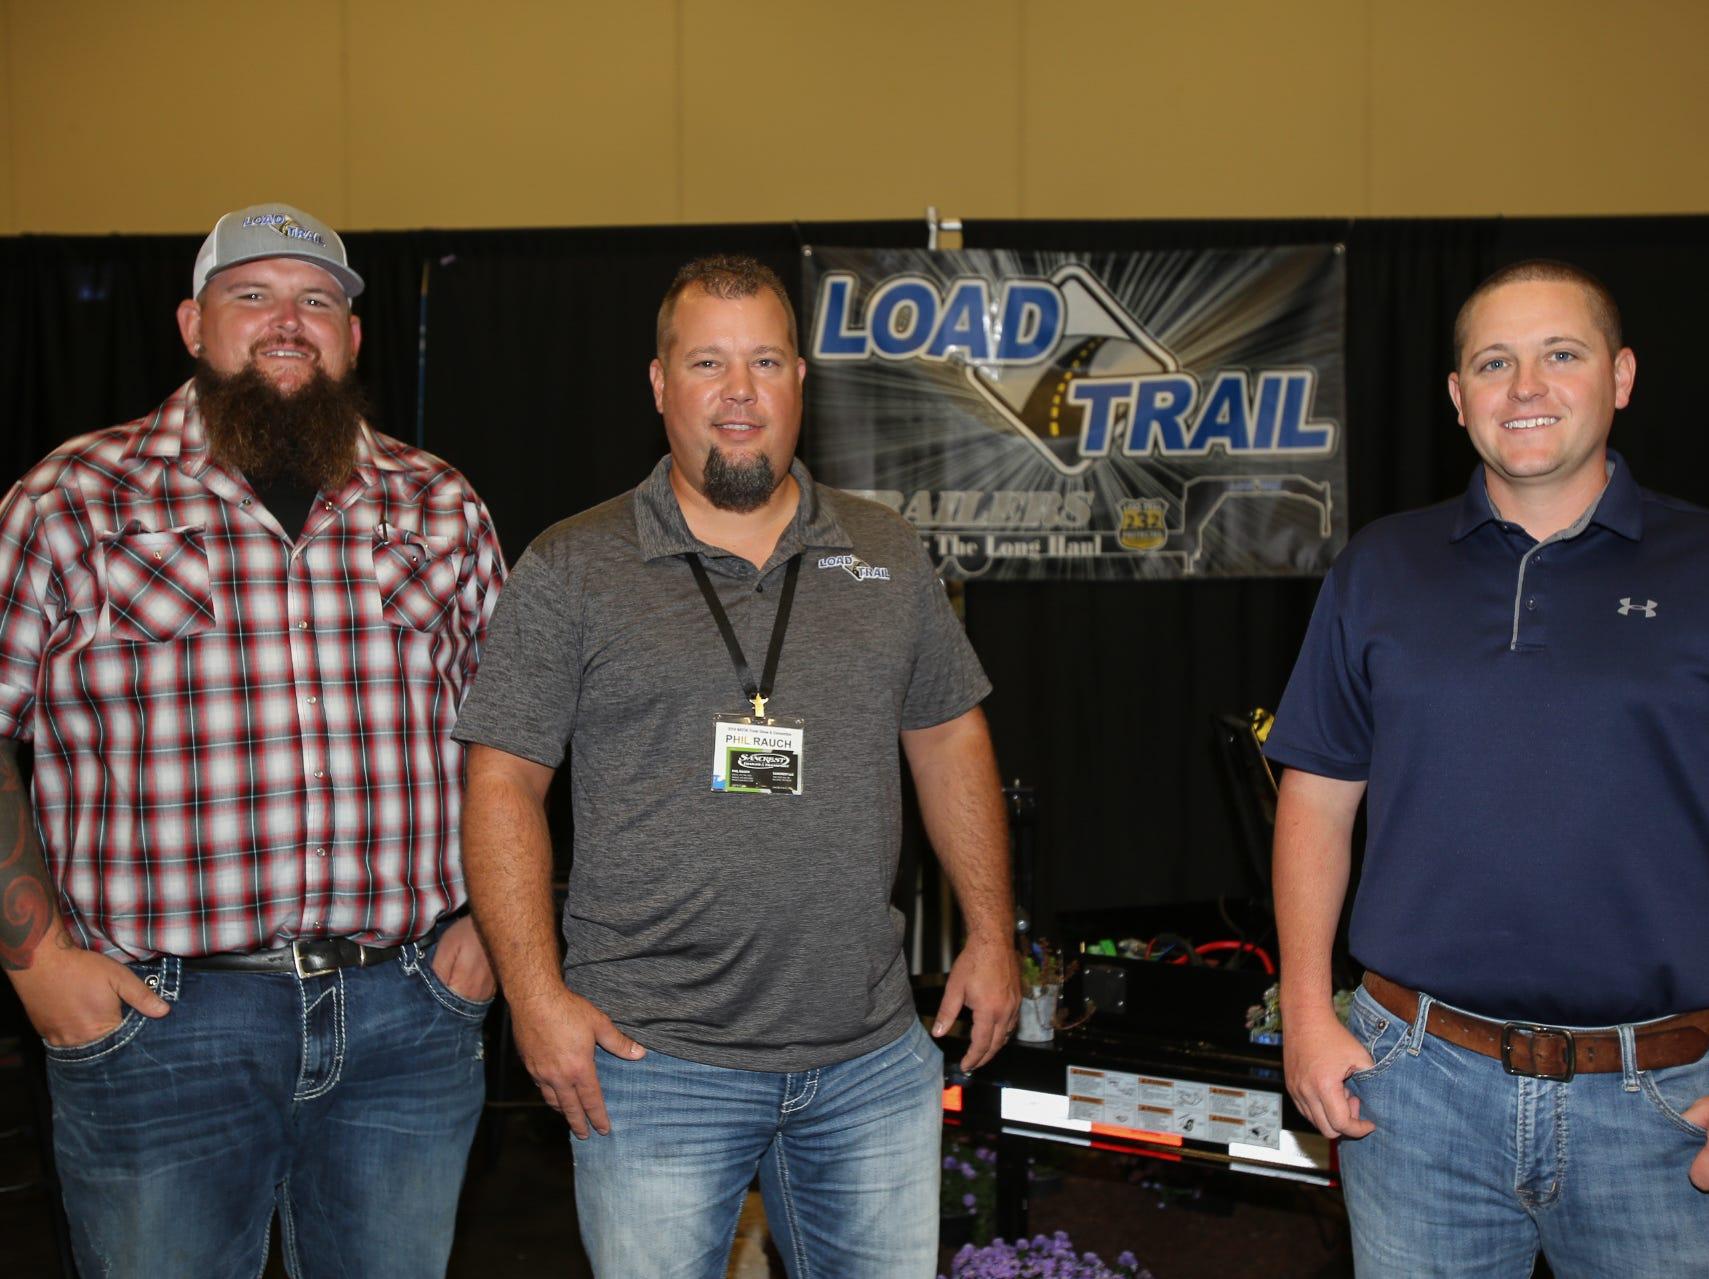 Pat Miller, Phil Rauch, and Jeffrey Lee